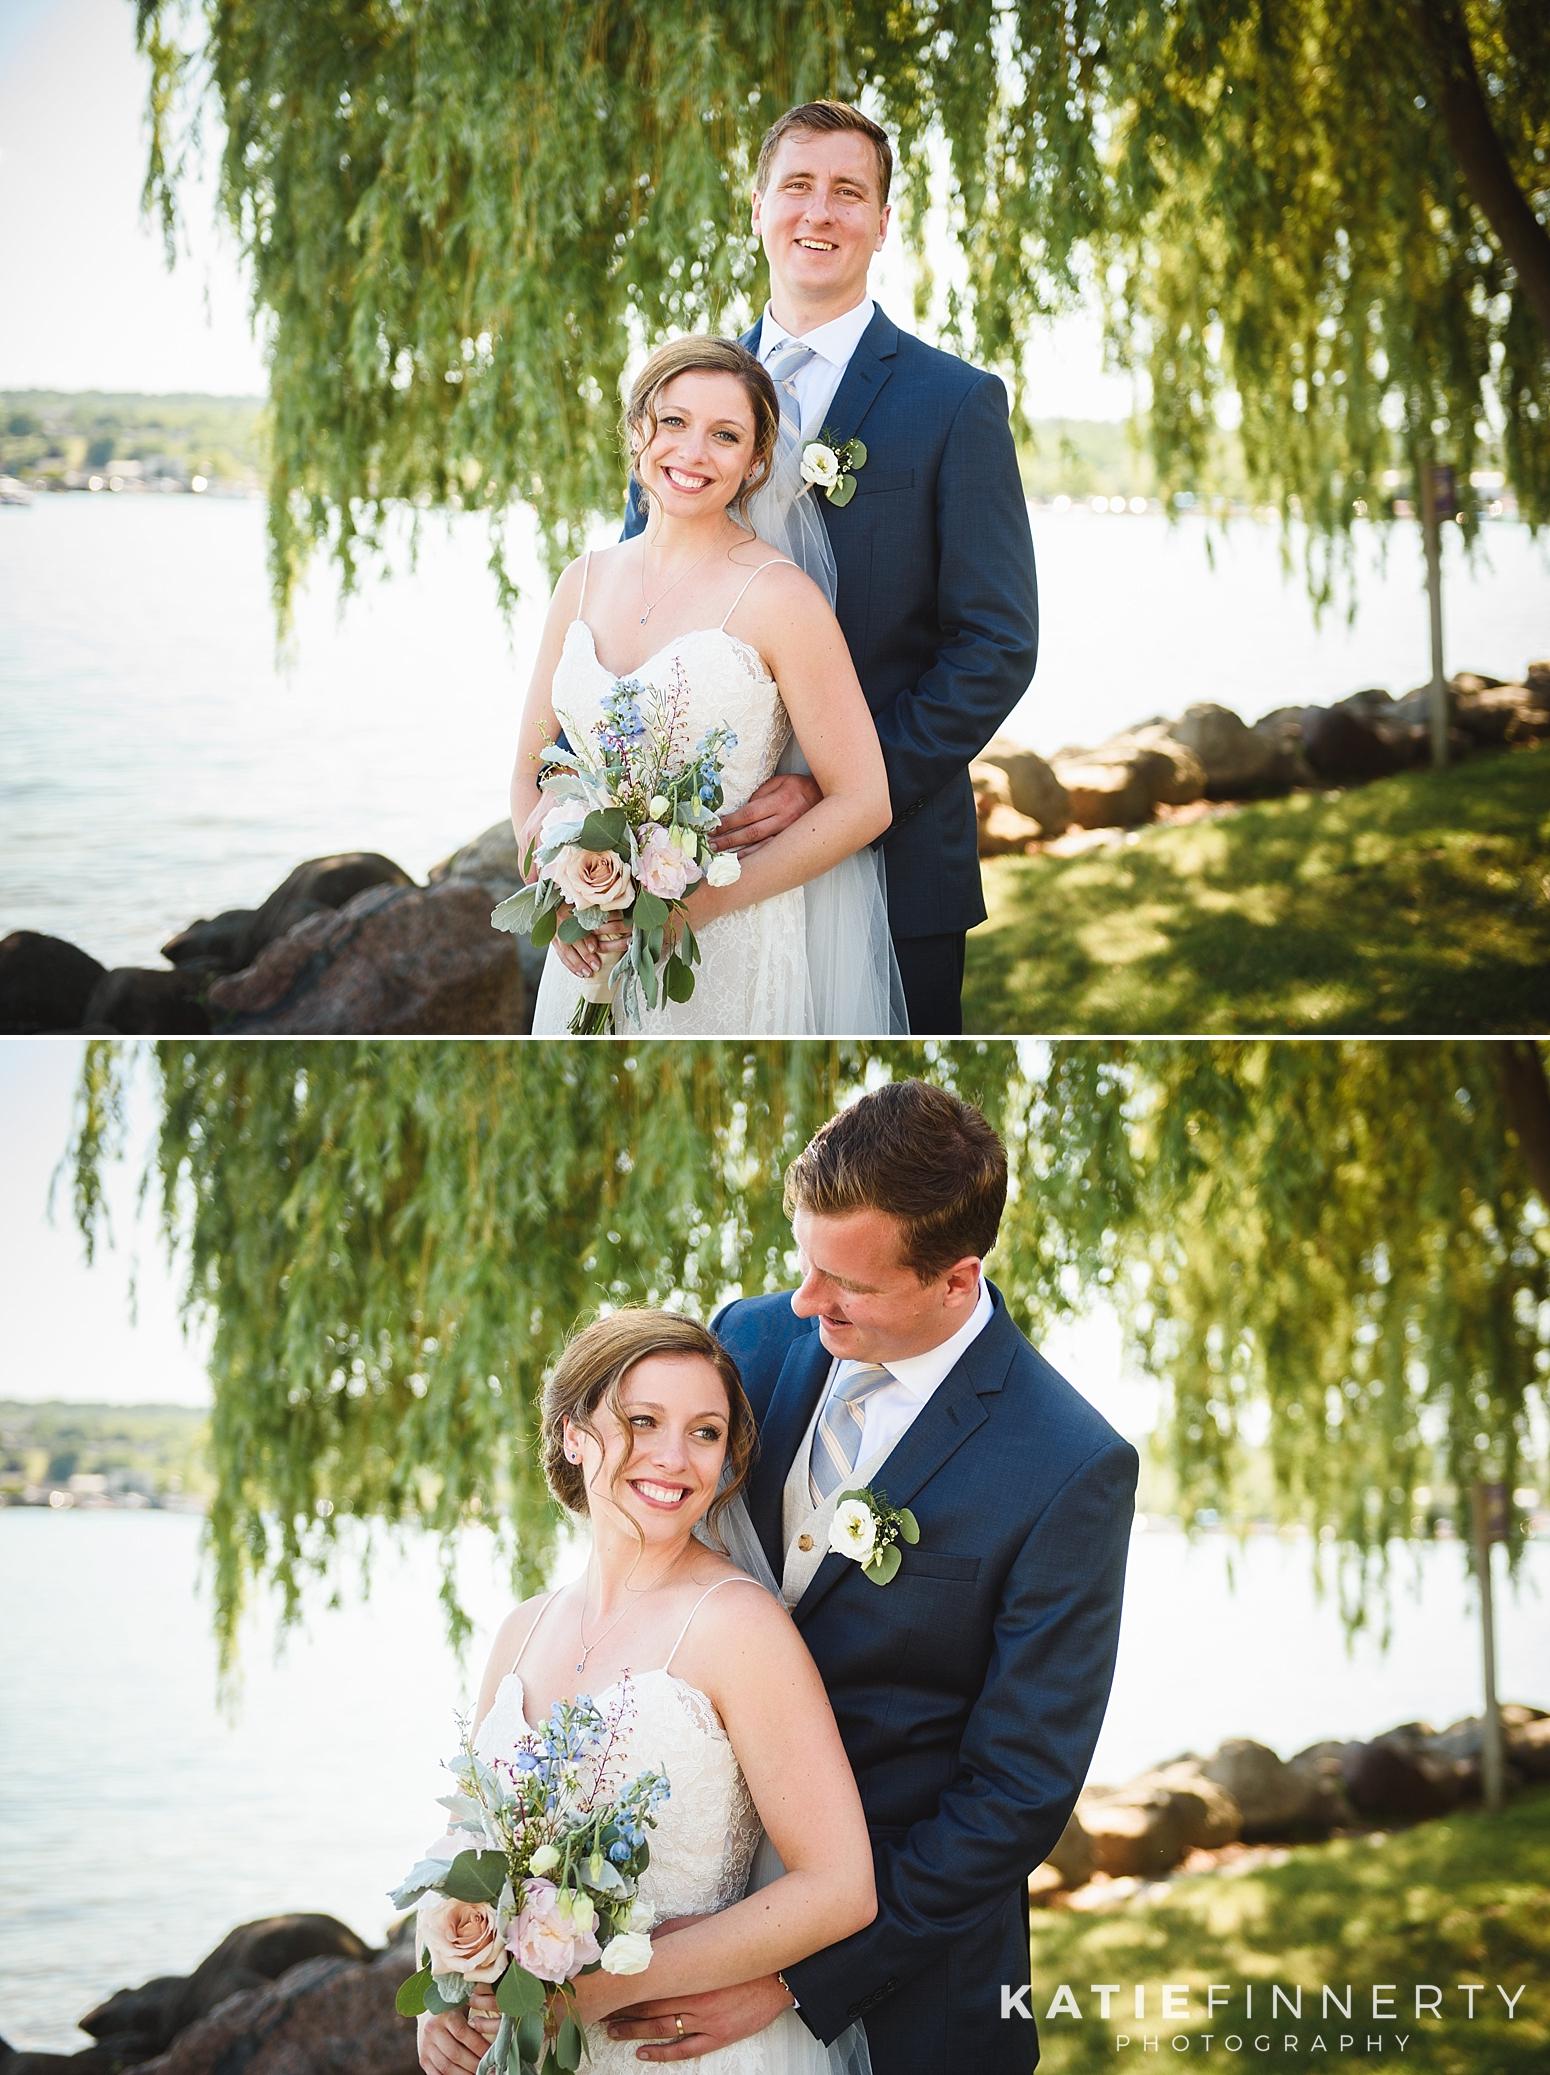 Inn on the Lake Canandaigua Wedding Photography